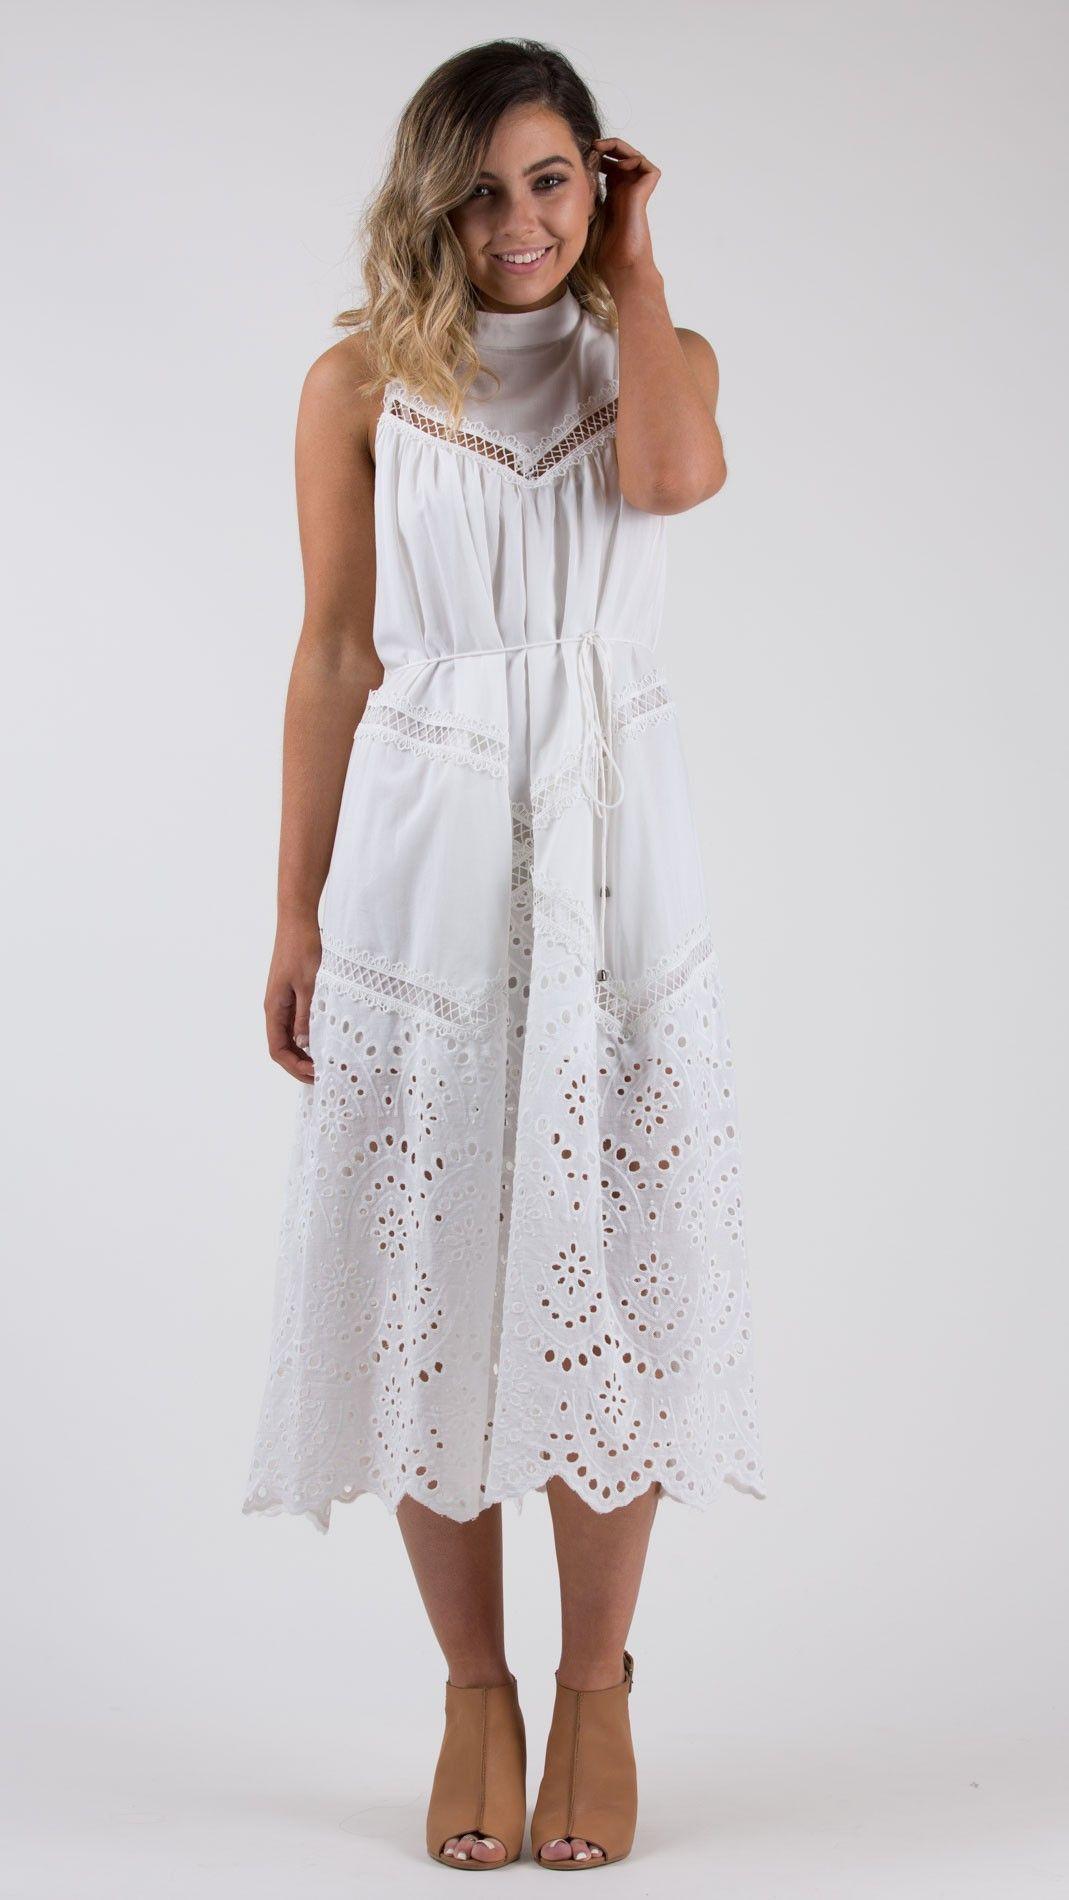 95d2a01ca88 Audrey Dress - Feather and Noise | Clothes | Dresses, White dress ...